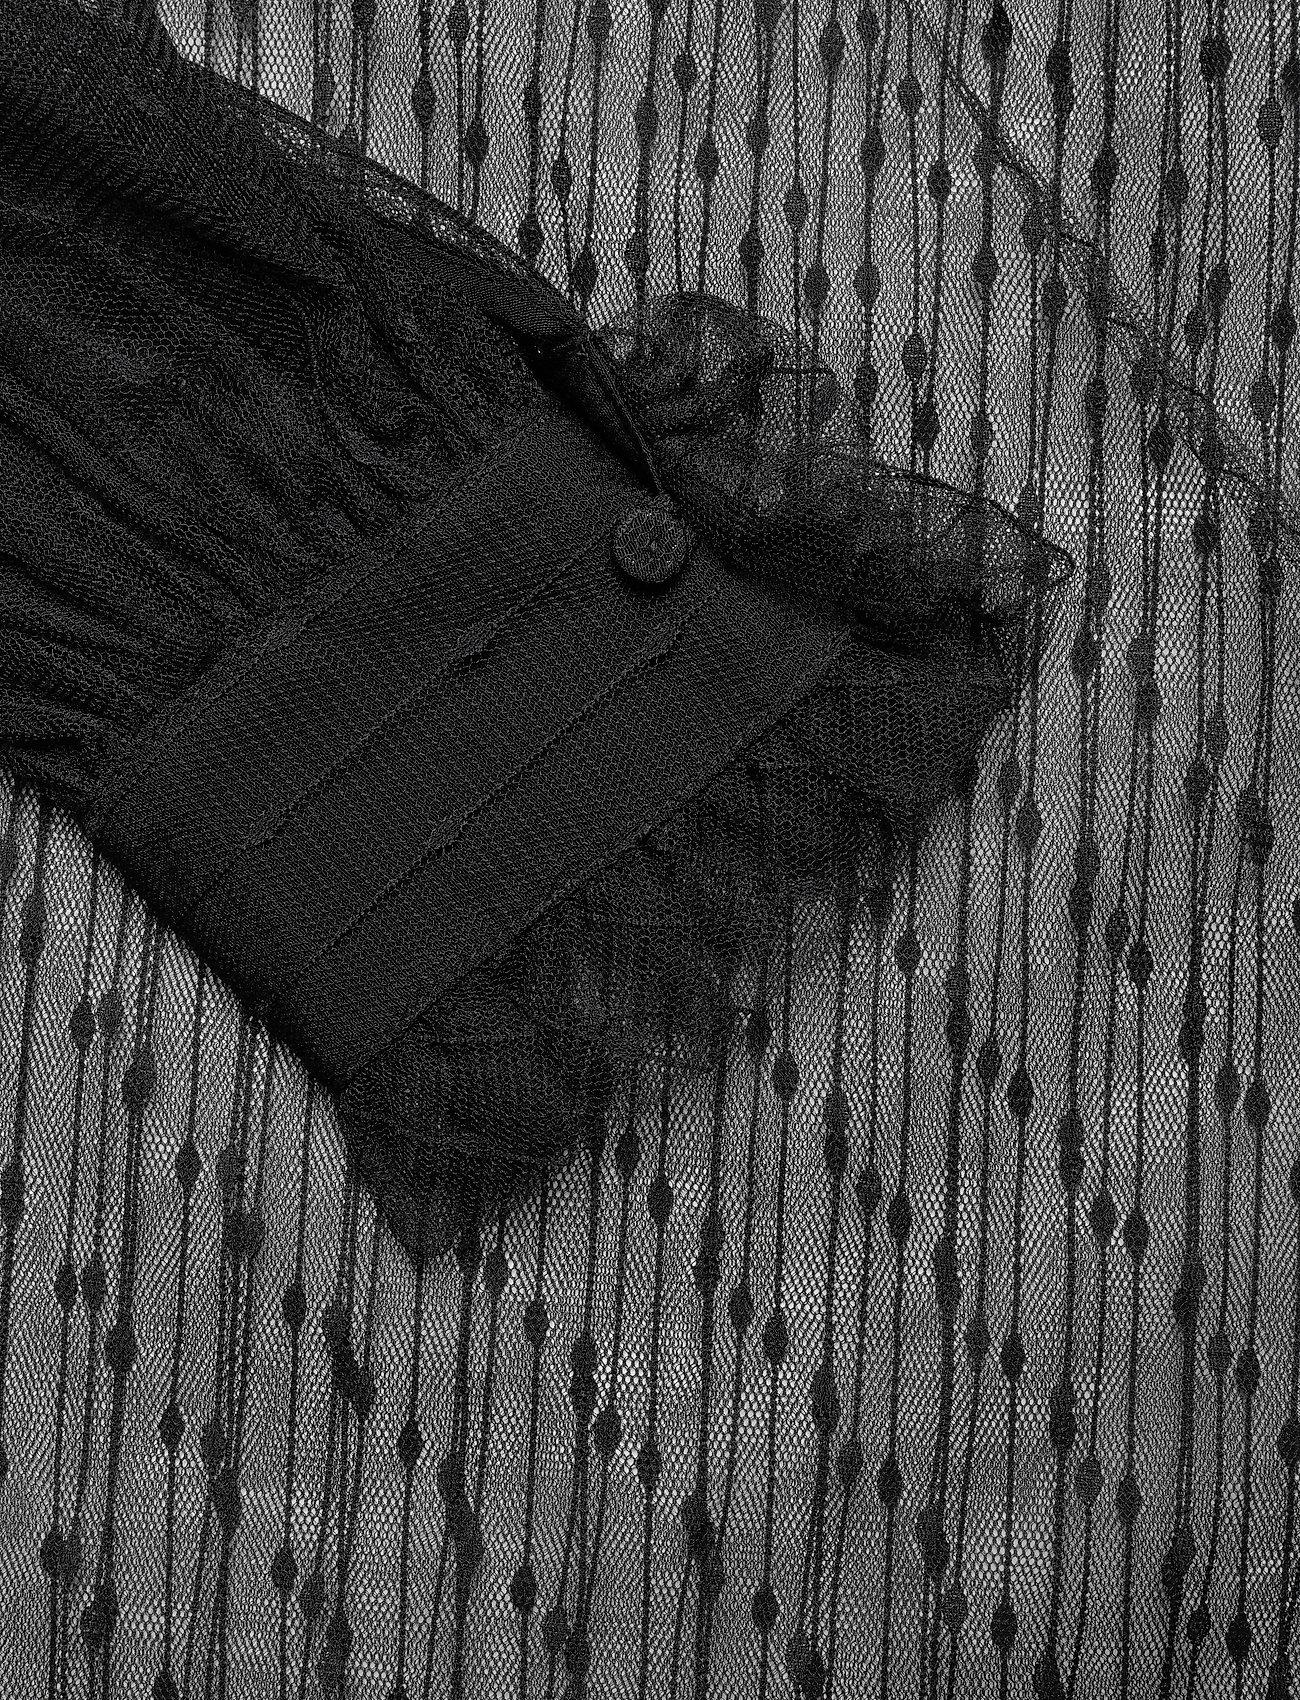 Givotia (Black) (1099.50 kr) - By Malene Birger